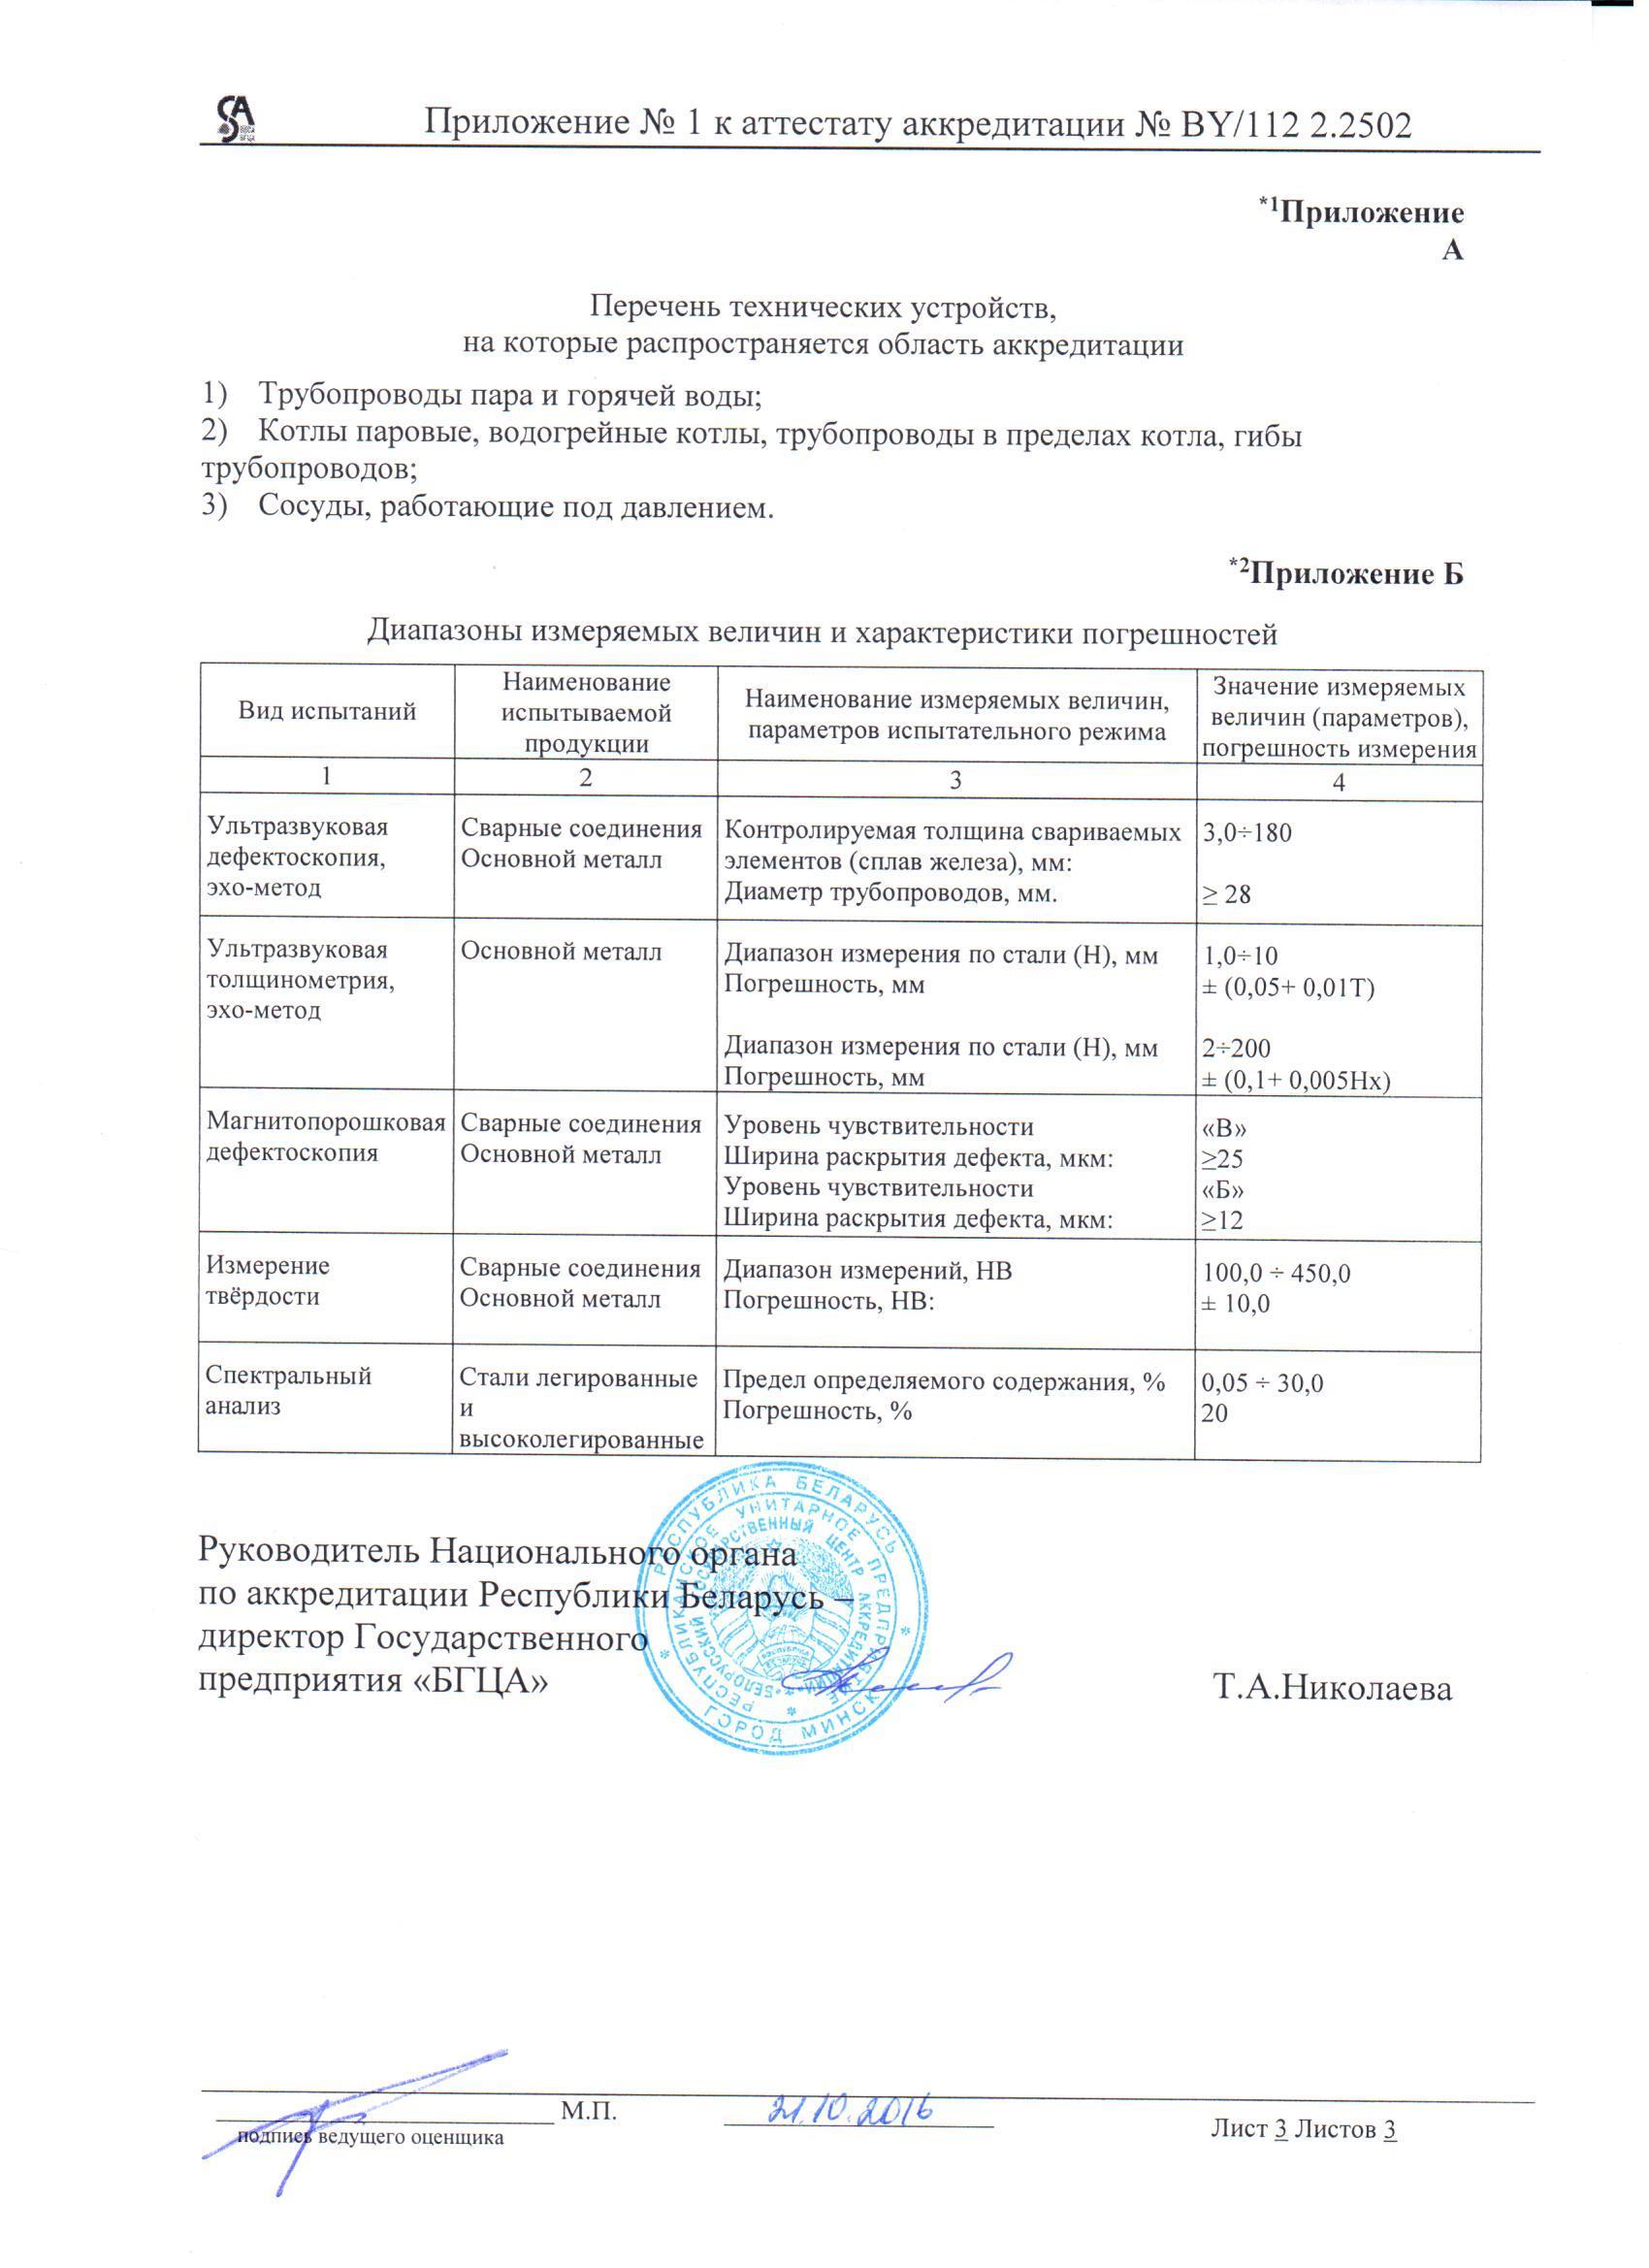 Обл. аккредитации ЛКМиС 03